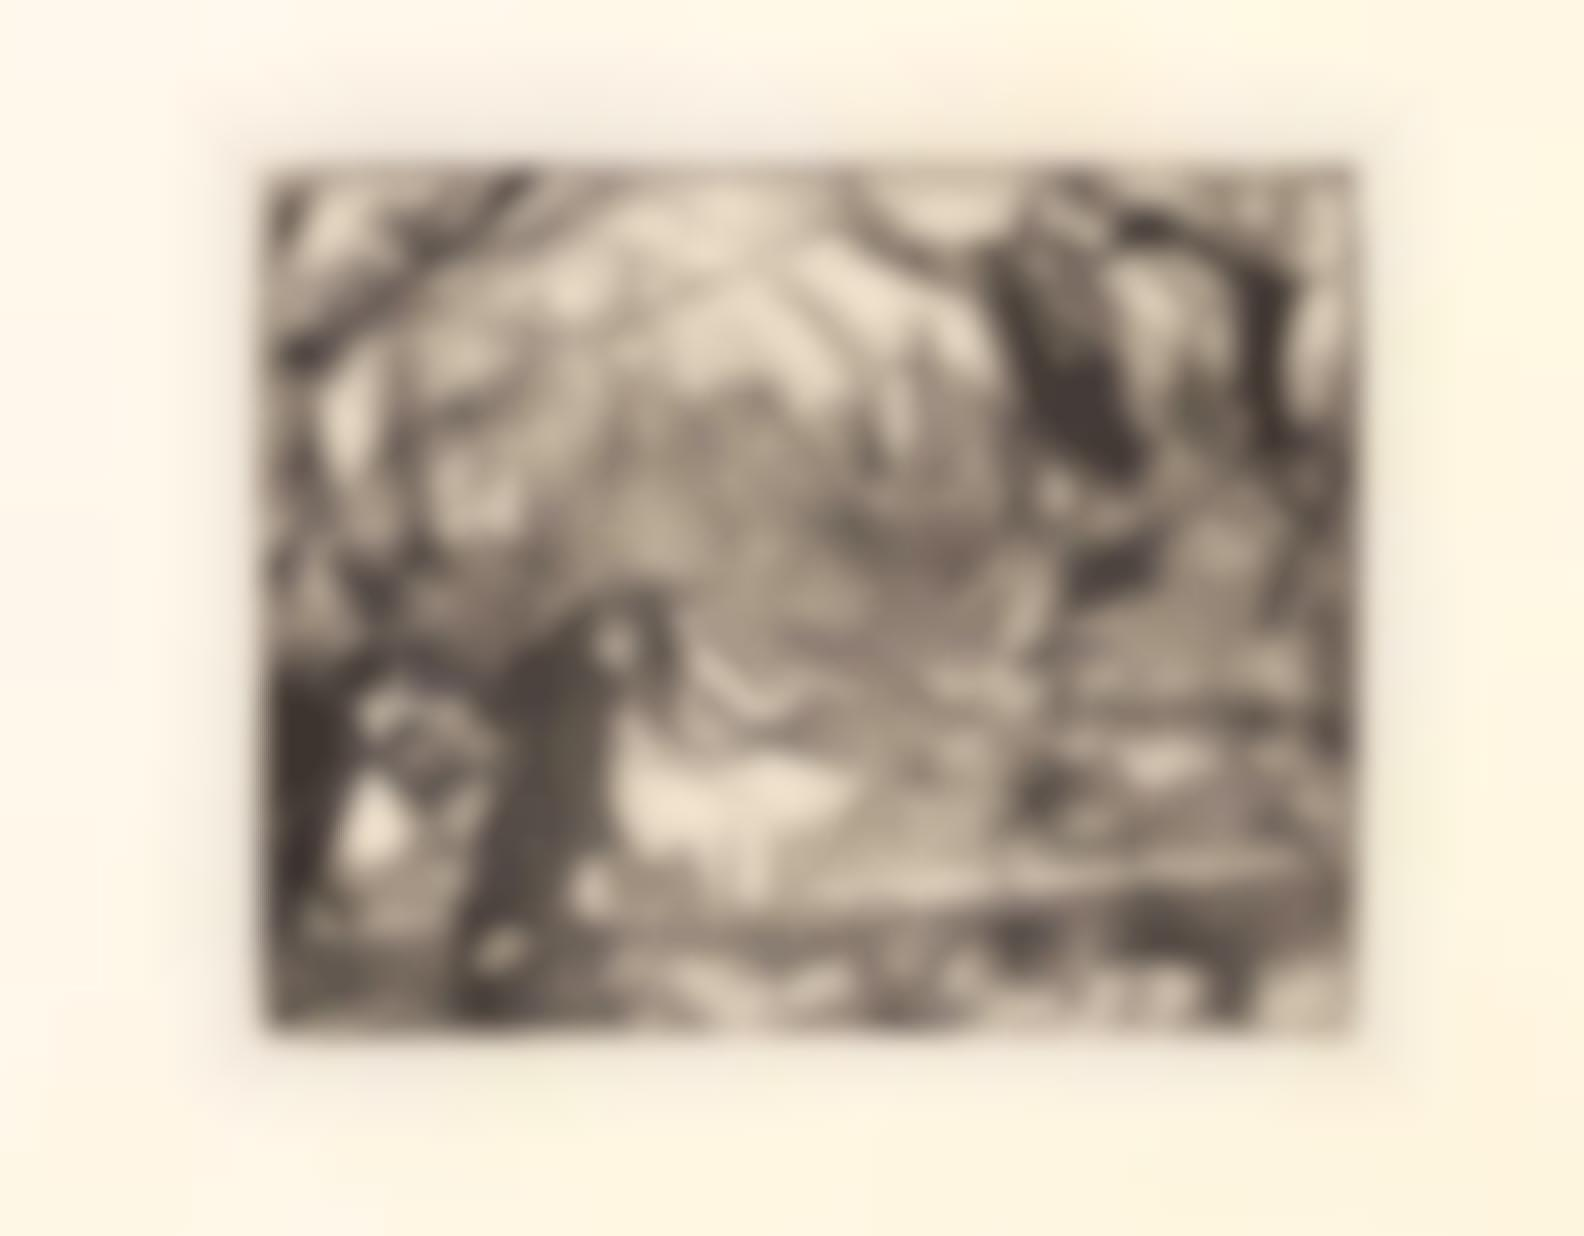 Edgar Degas-Sur La Scene Iii(Delteil 32; Adhemar 26; Reed & Shapero 24)-1877